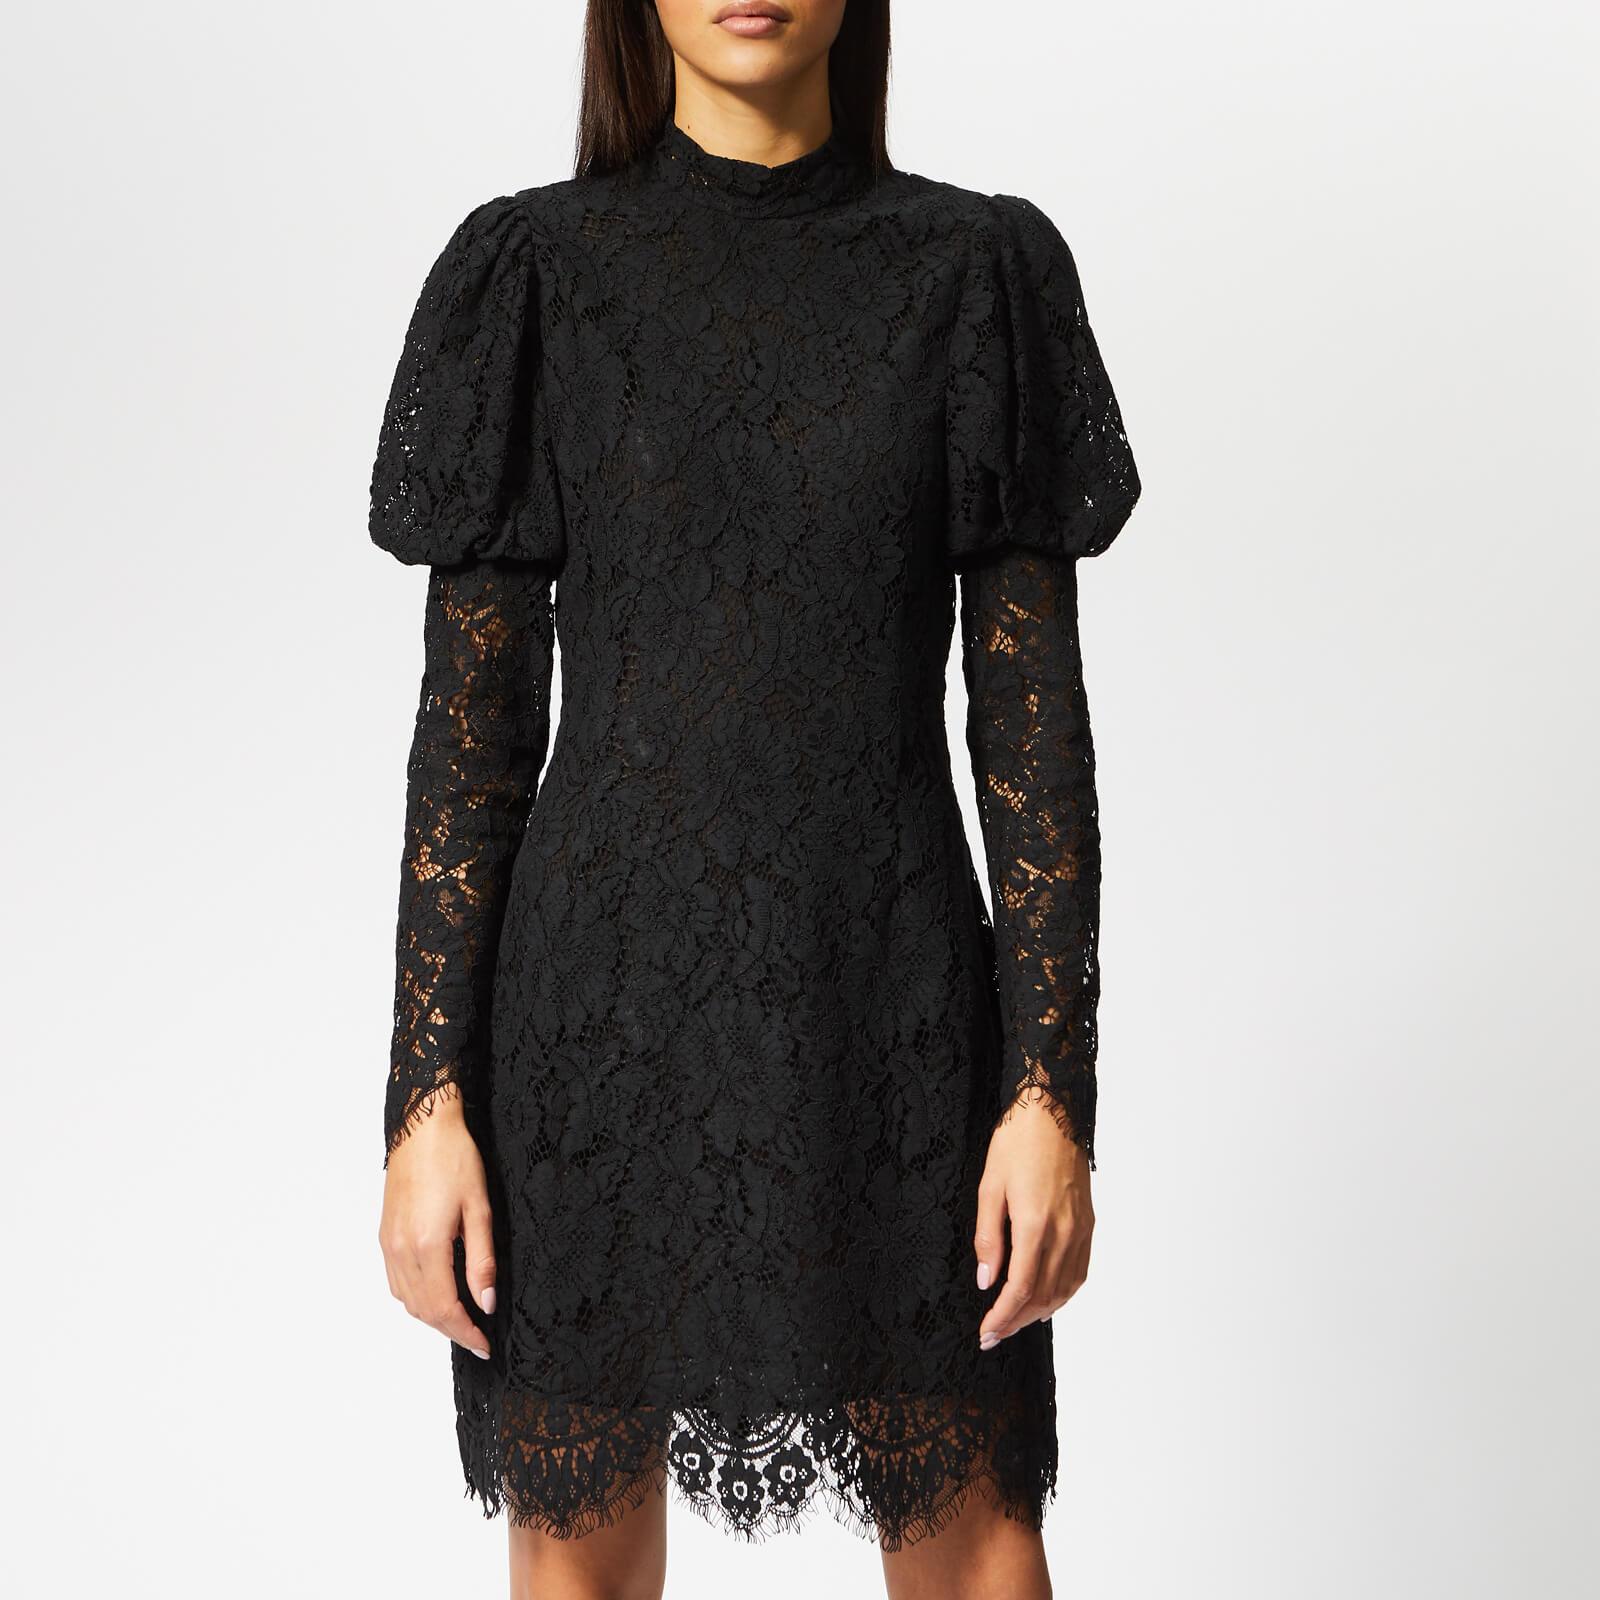 c40e1ef9b23 Ganni Women's Everdale Lace Dress - Black - Free UK Delivery over £50